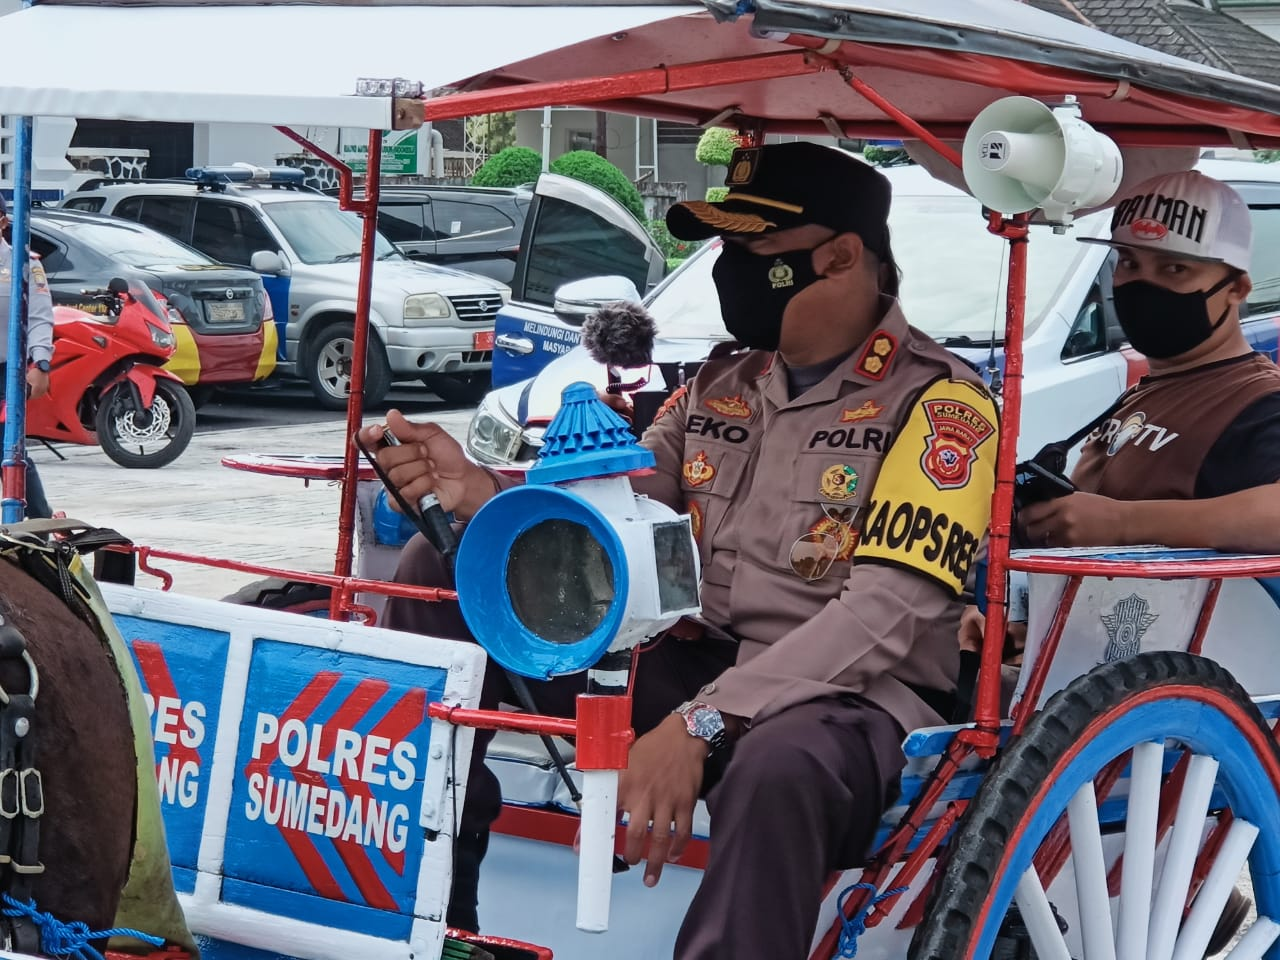 Lounching Delman Prokes Di Wilkum Polres Sumedang Polda Jabar